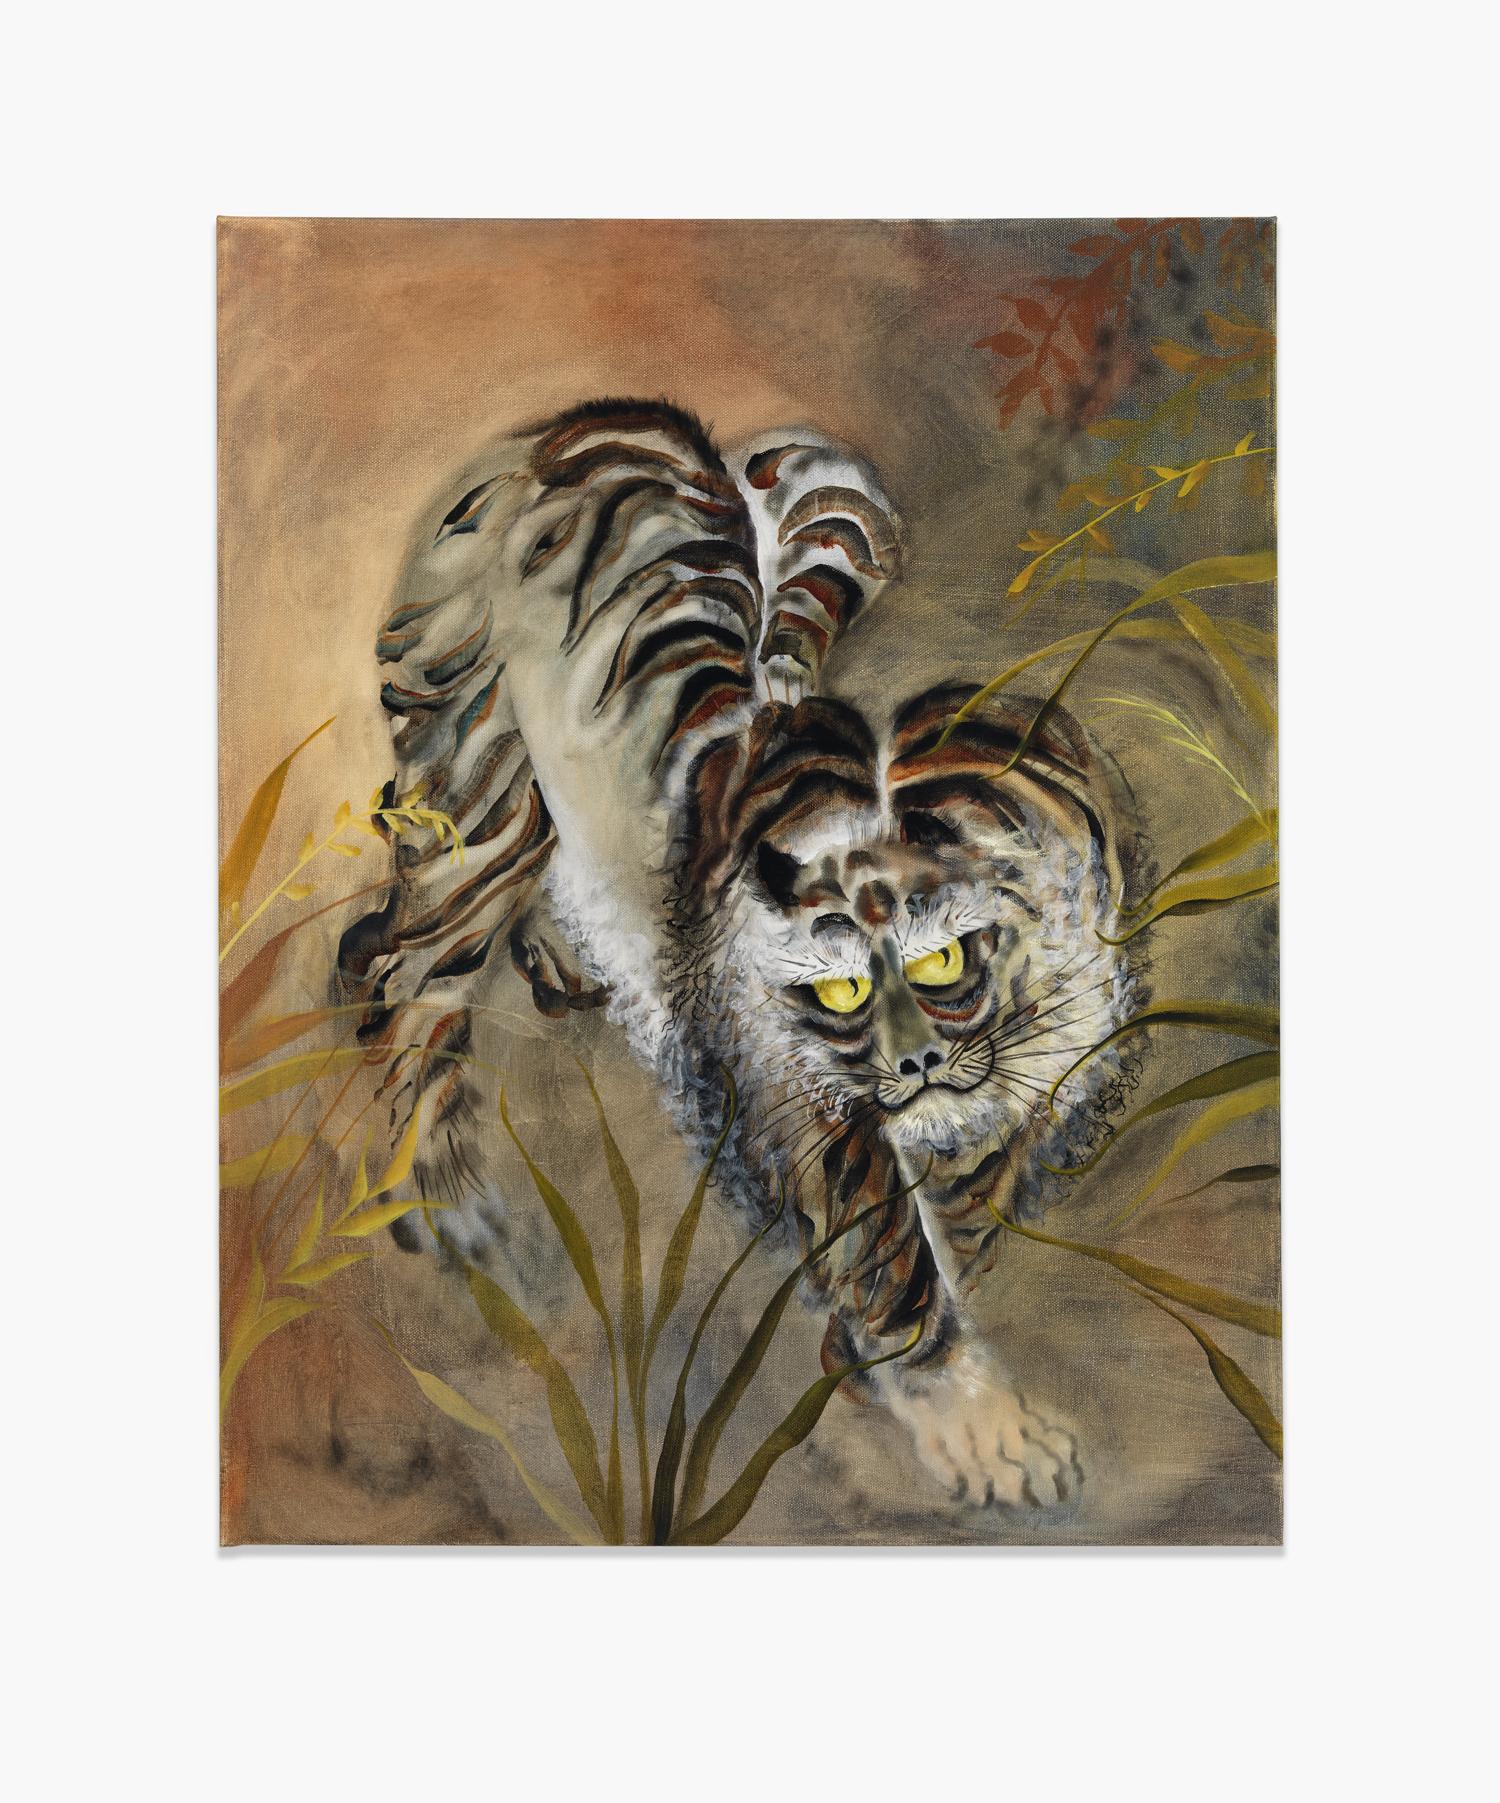 Autumn Ramsey,  Chupacabra , 2015, oil on canvas, 30 x 24 inches (70.6 x 60.9 cm)